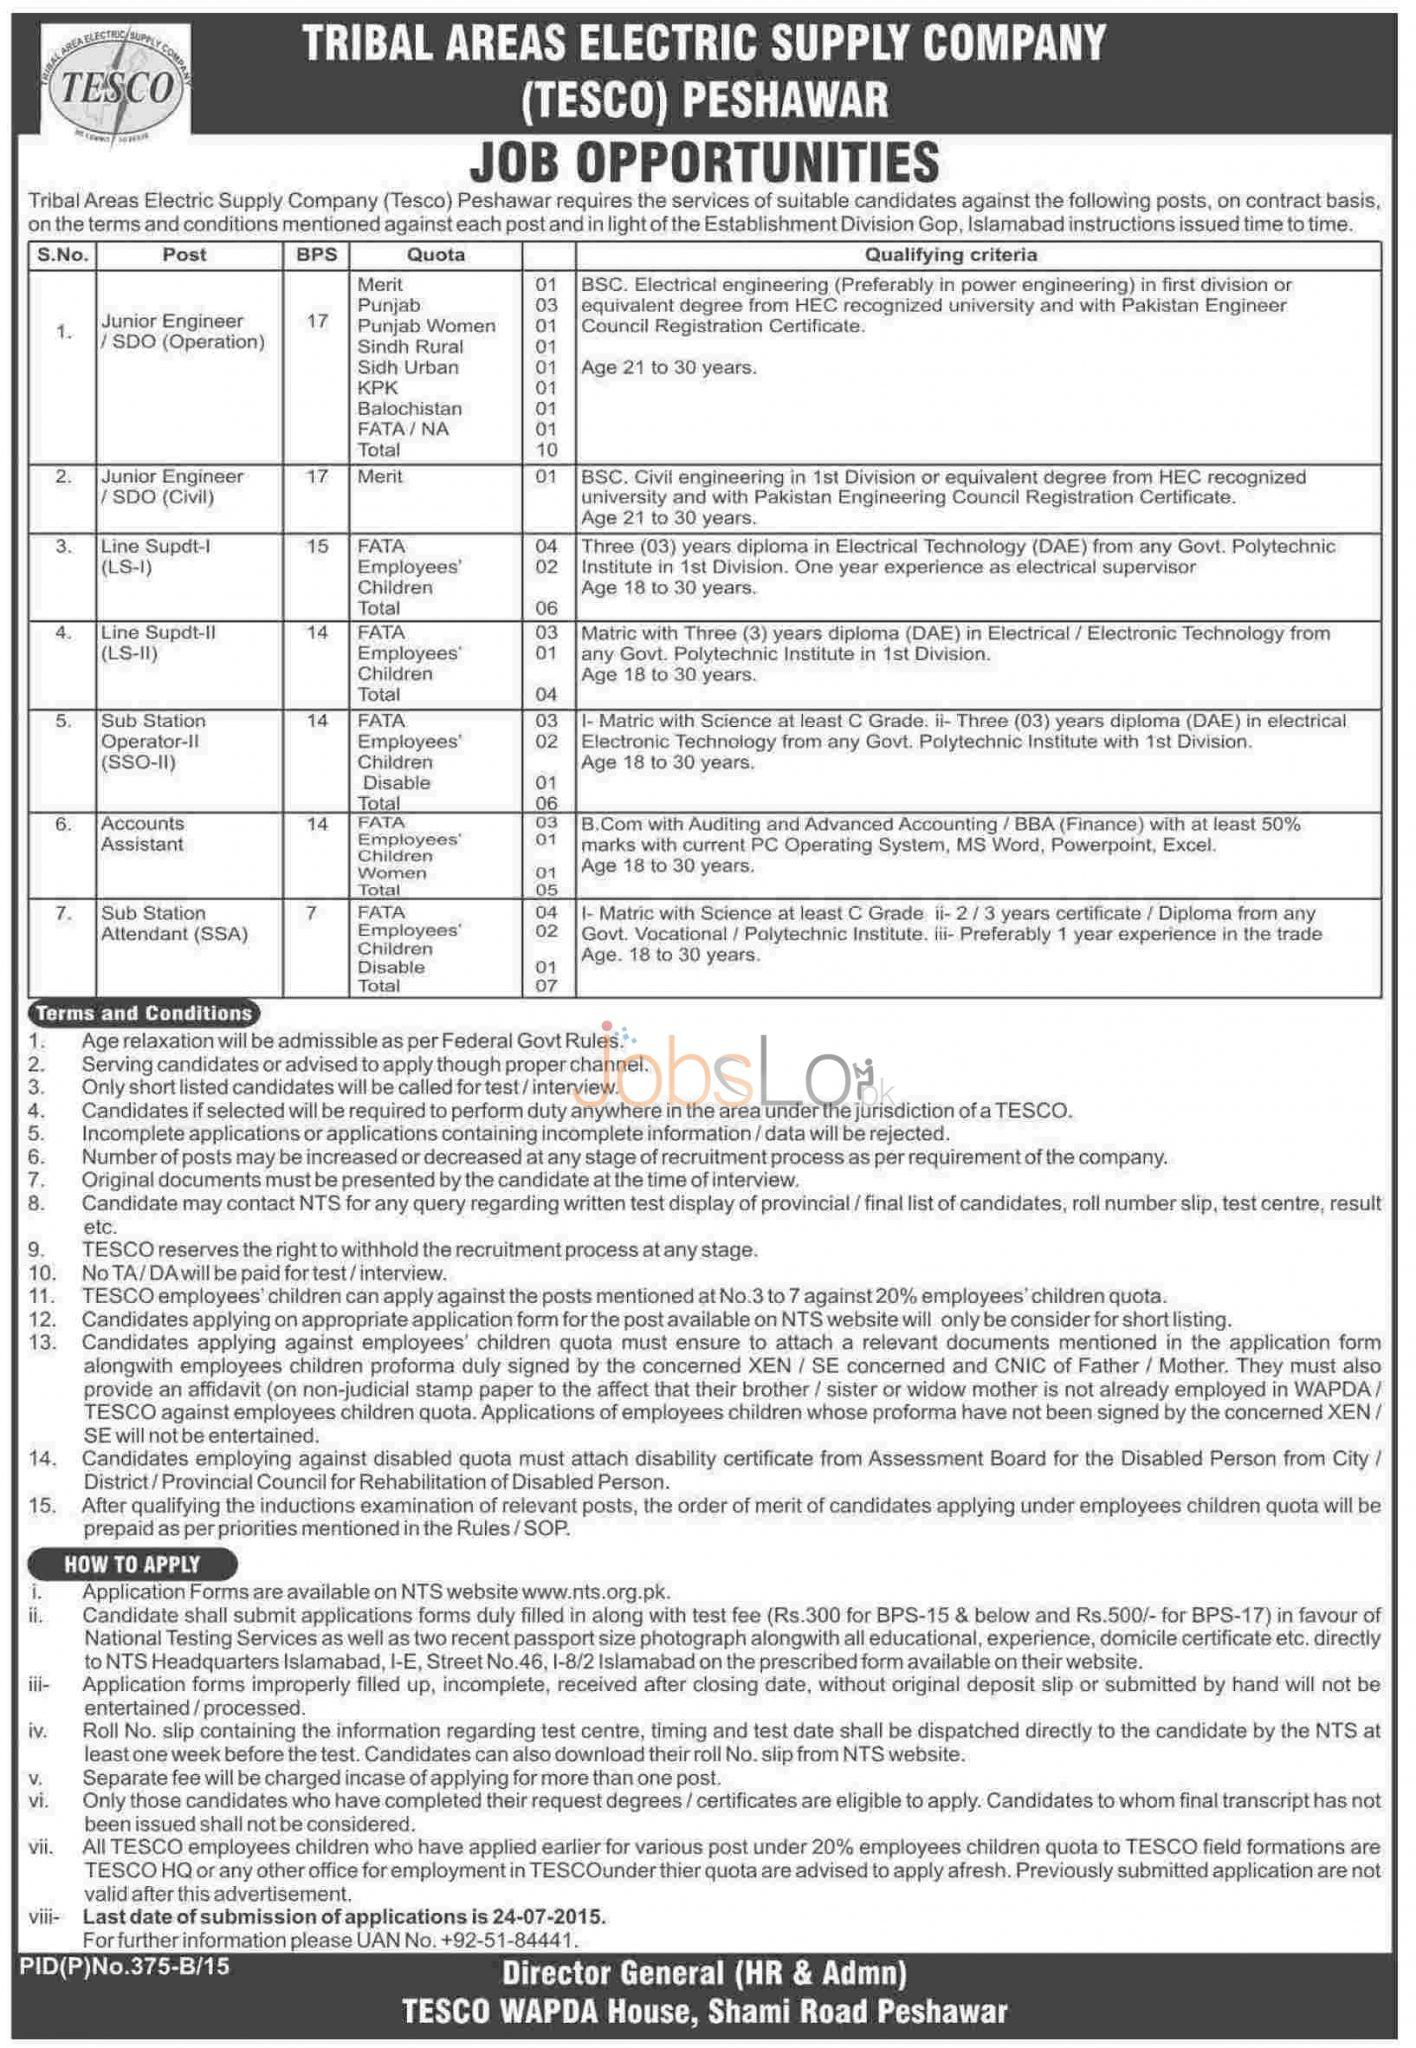 Nts Tesco Wapda Jobs 2015 Application Form Recruitment Test